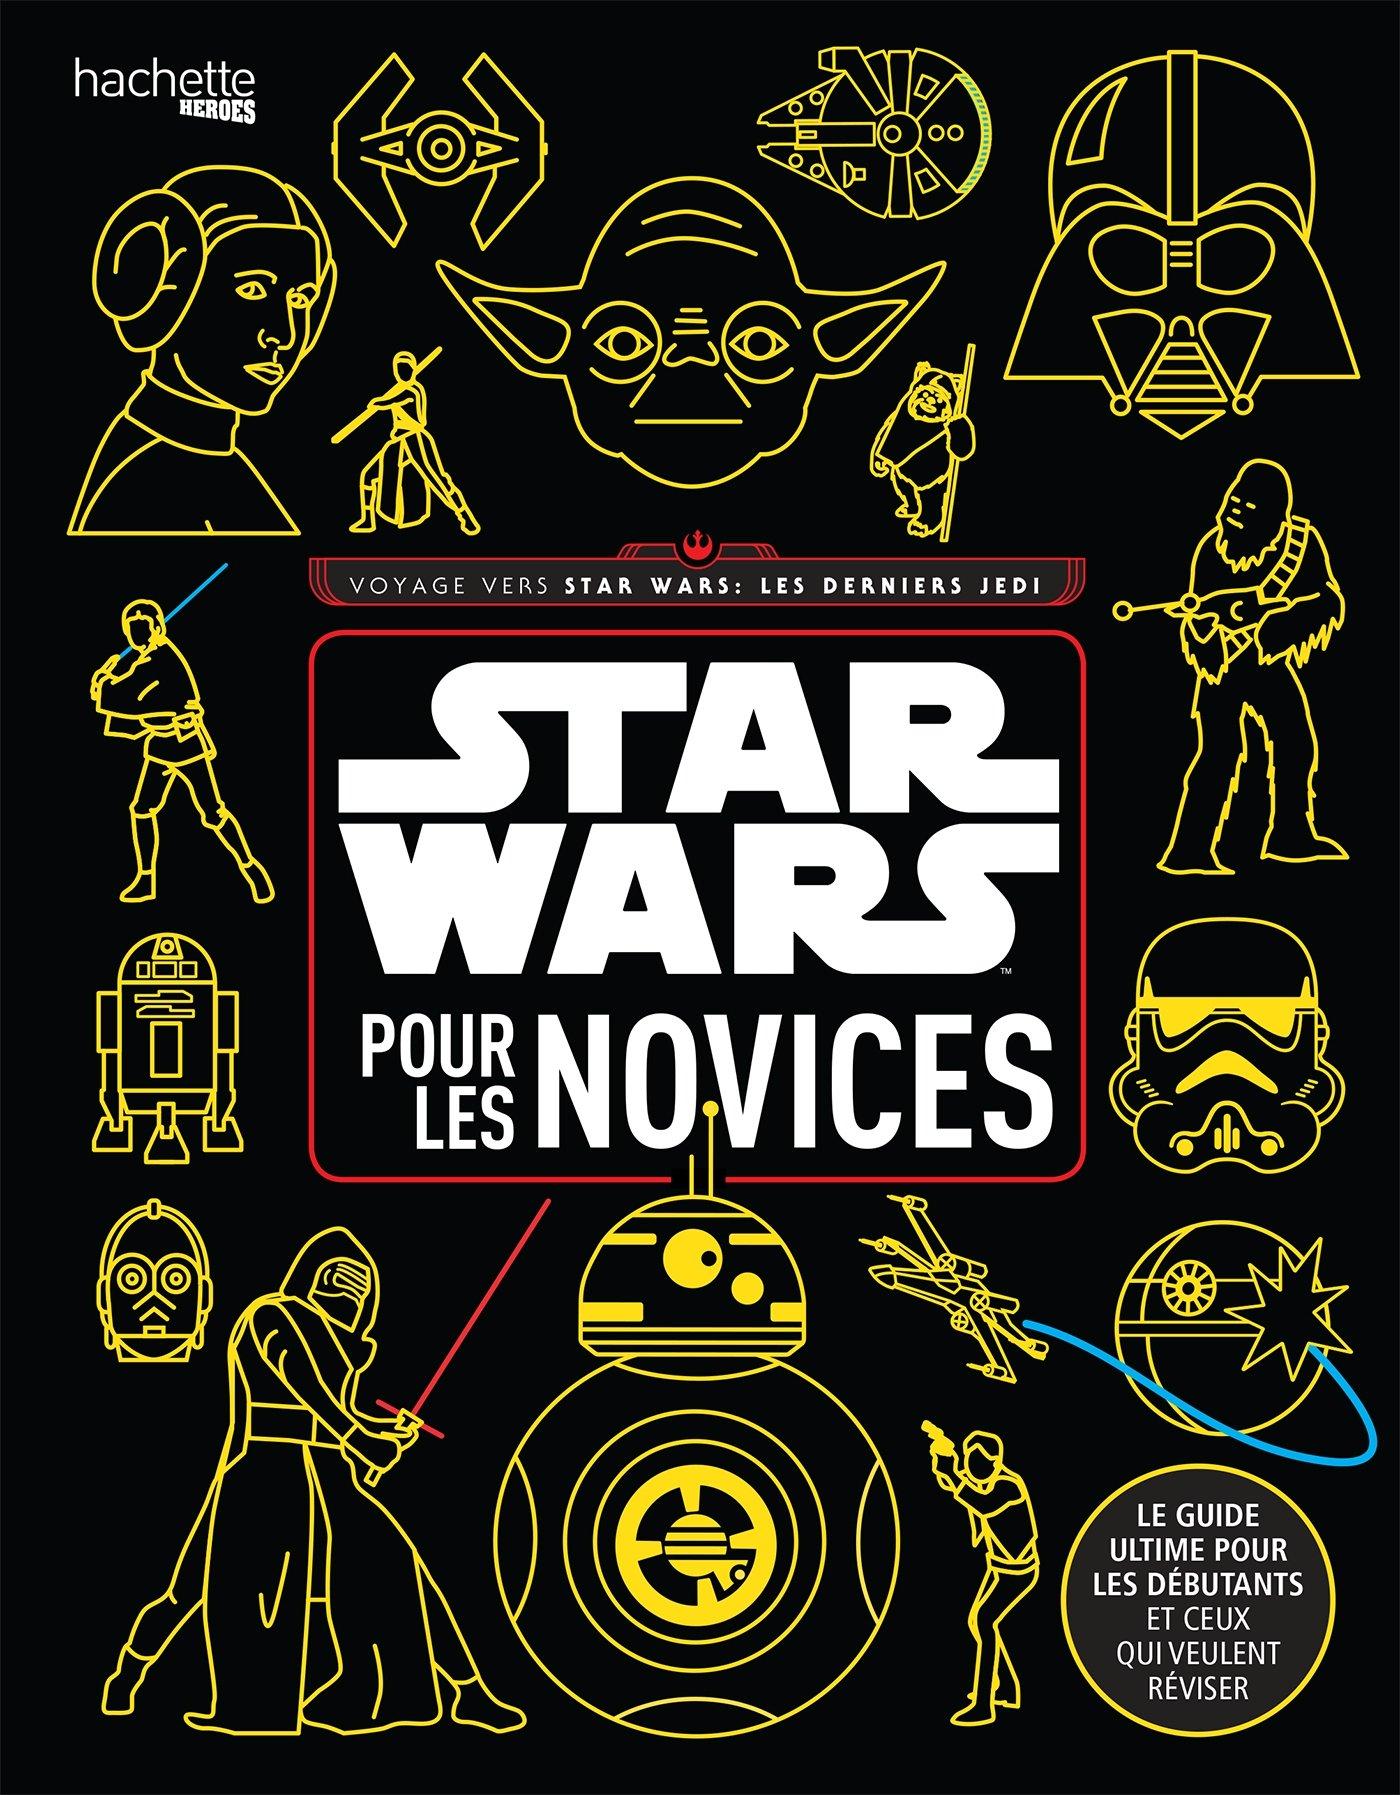 Nathan Star Wars pour les Novices